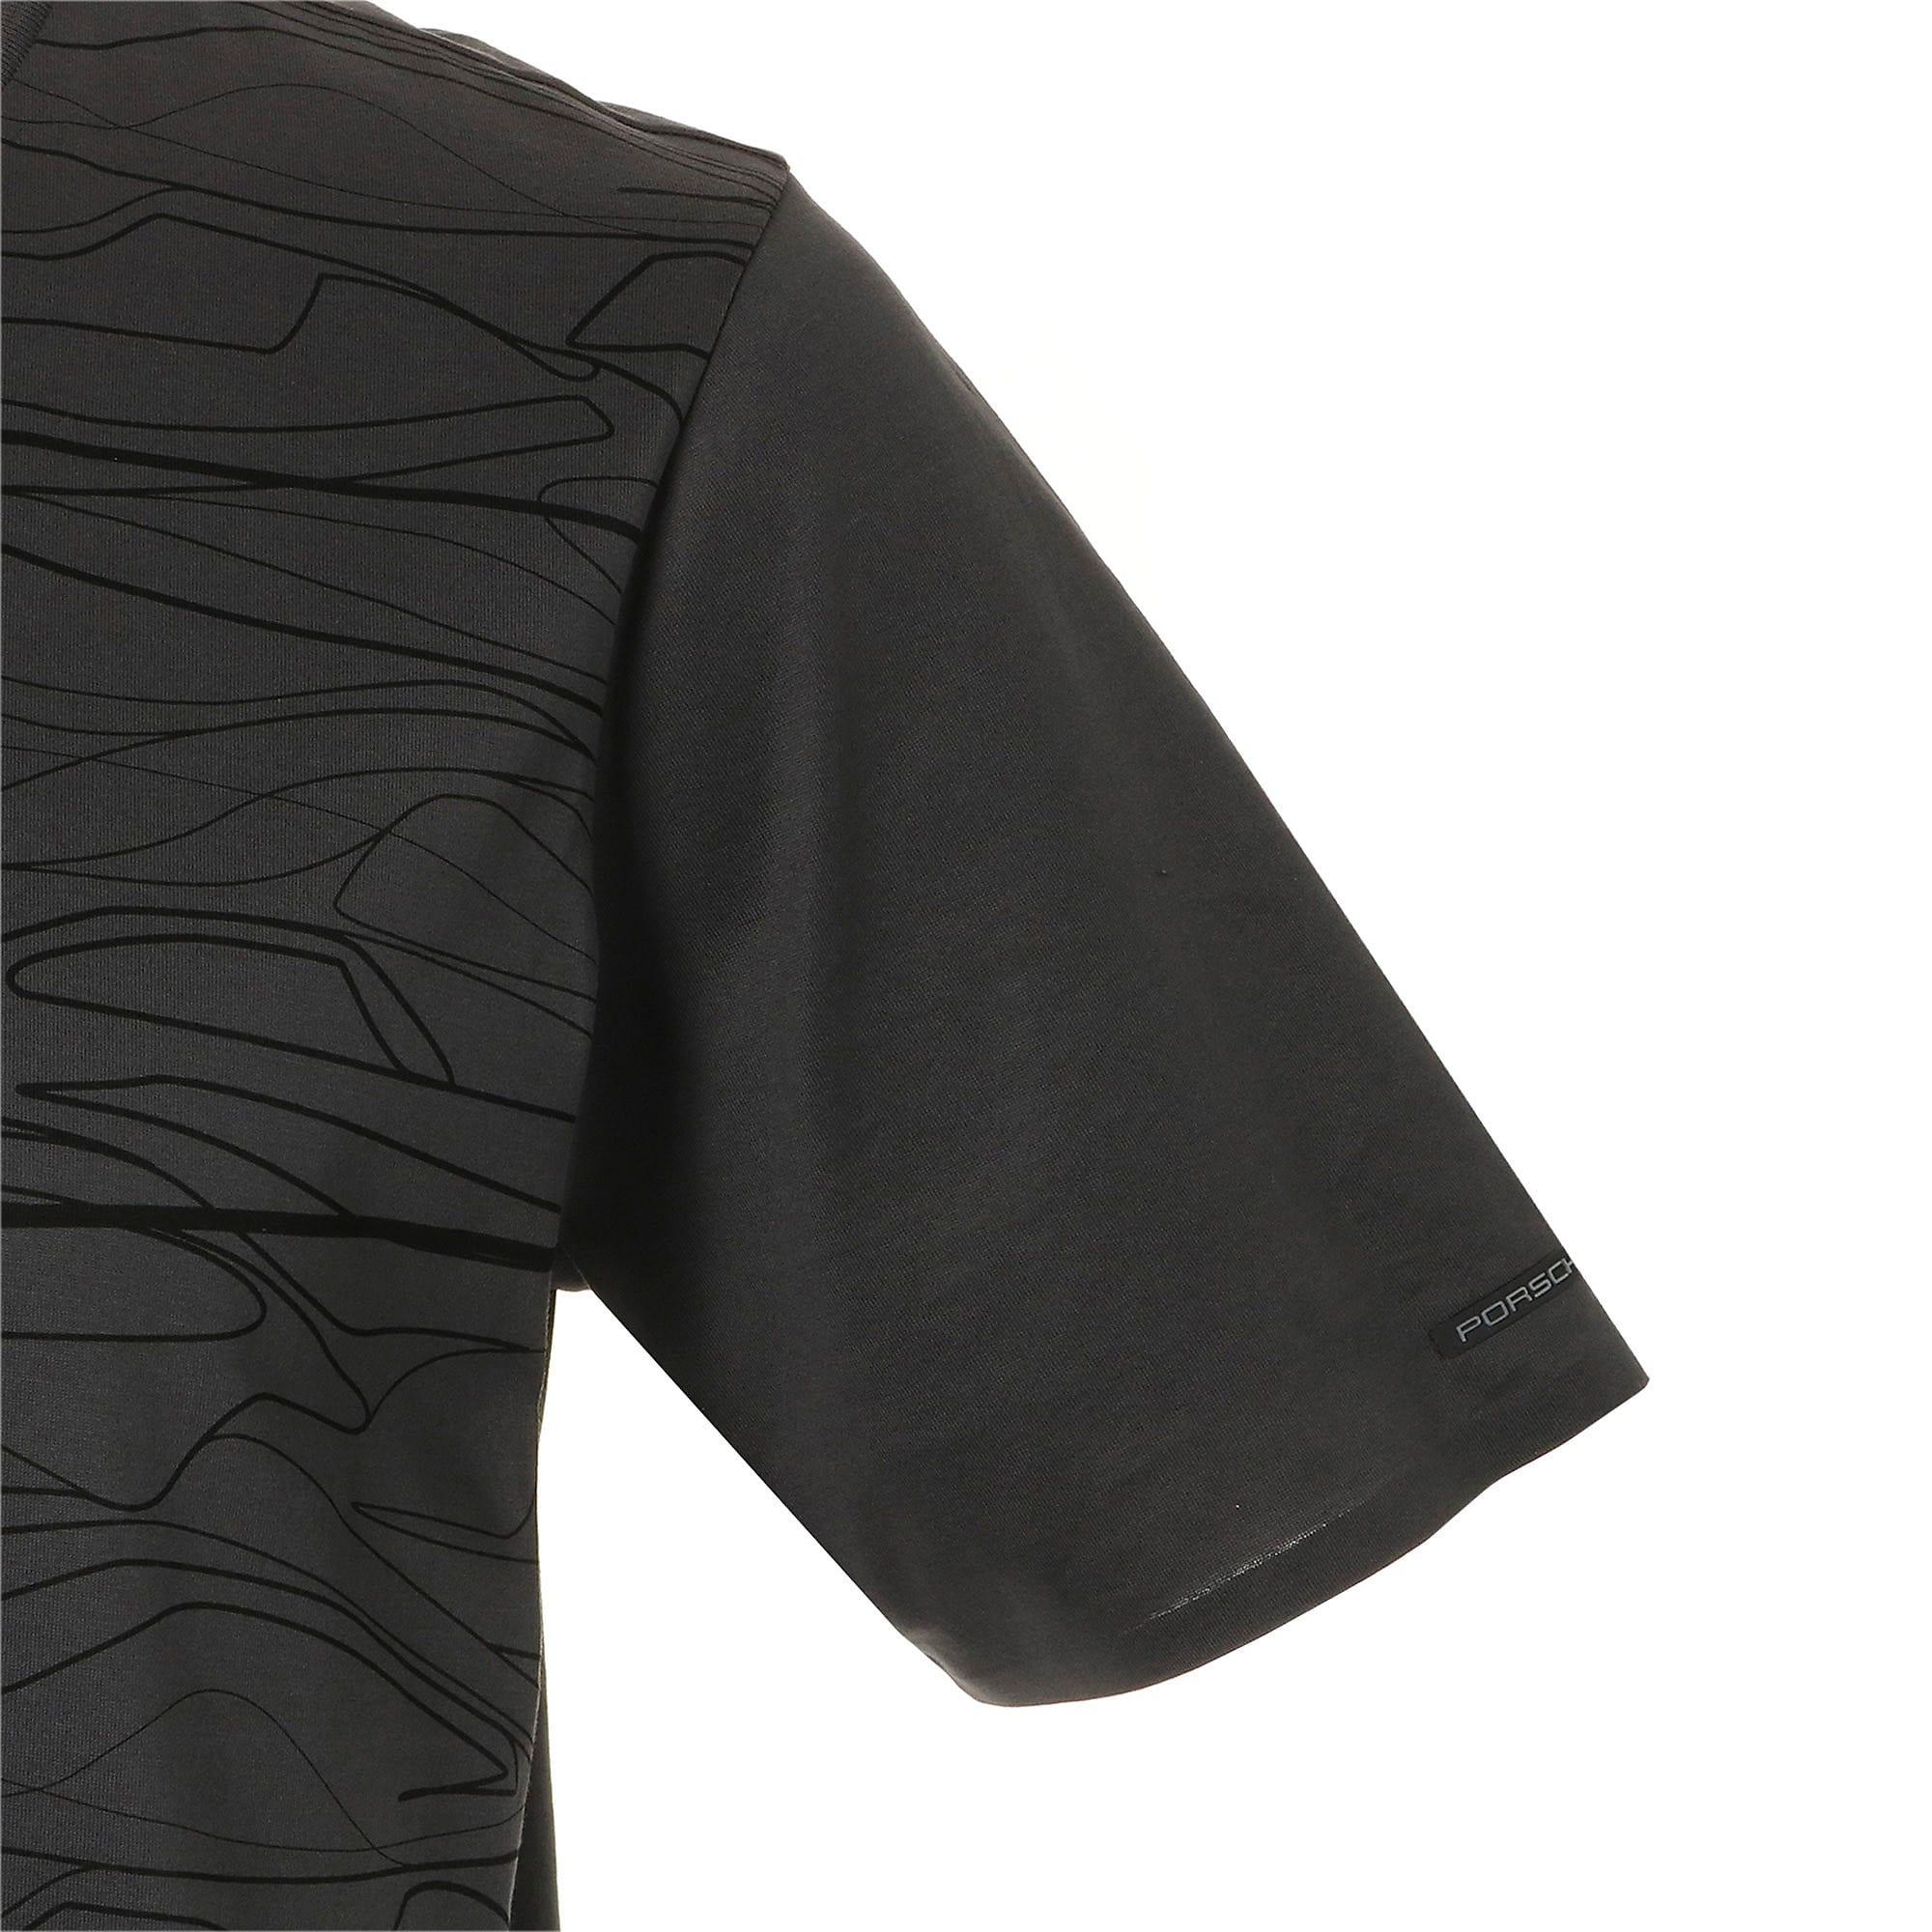 Thumbnail 5 of PORSCHE DESIGN  グラフィック Tシャツ, Asphalt, medium-JPN